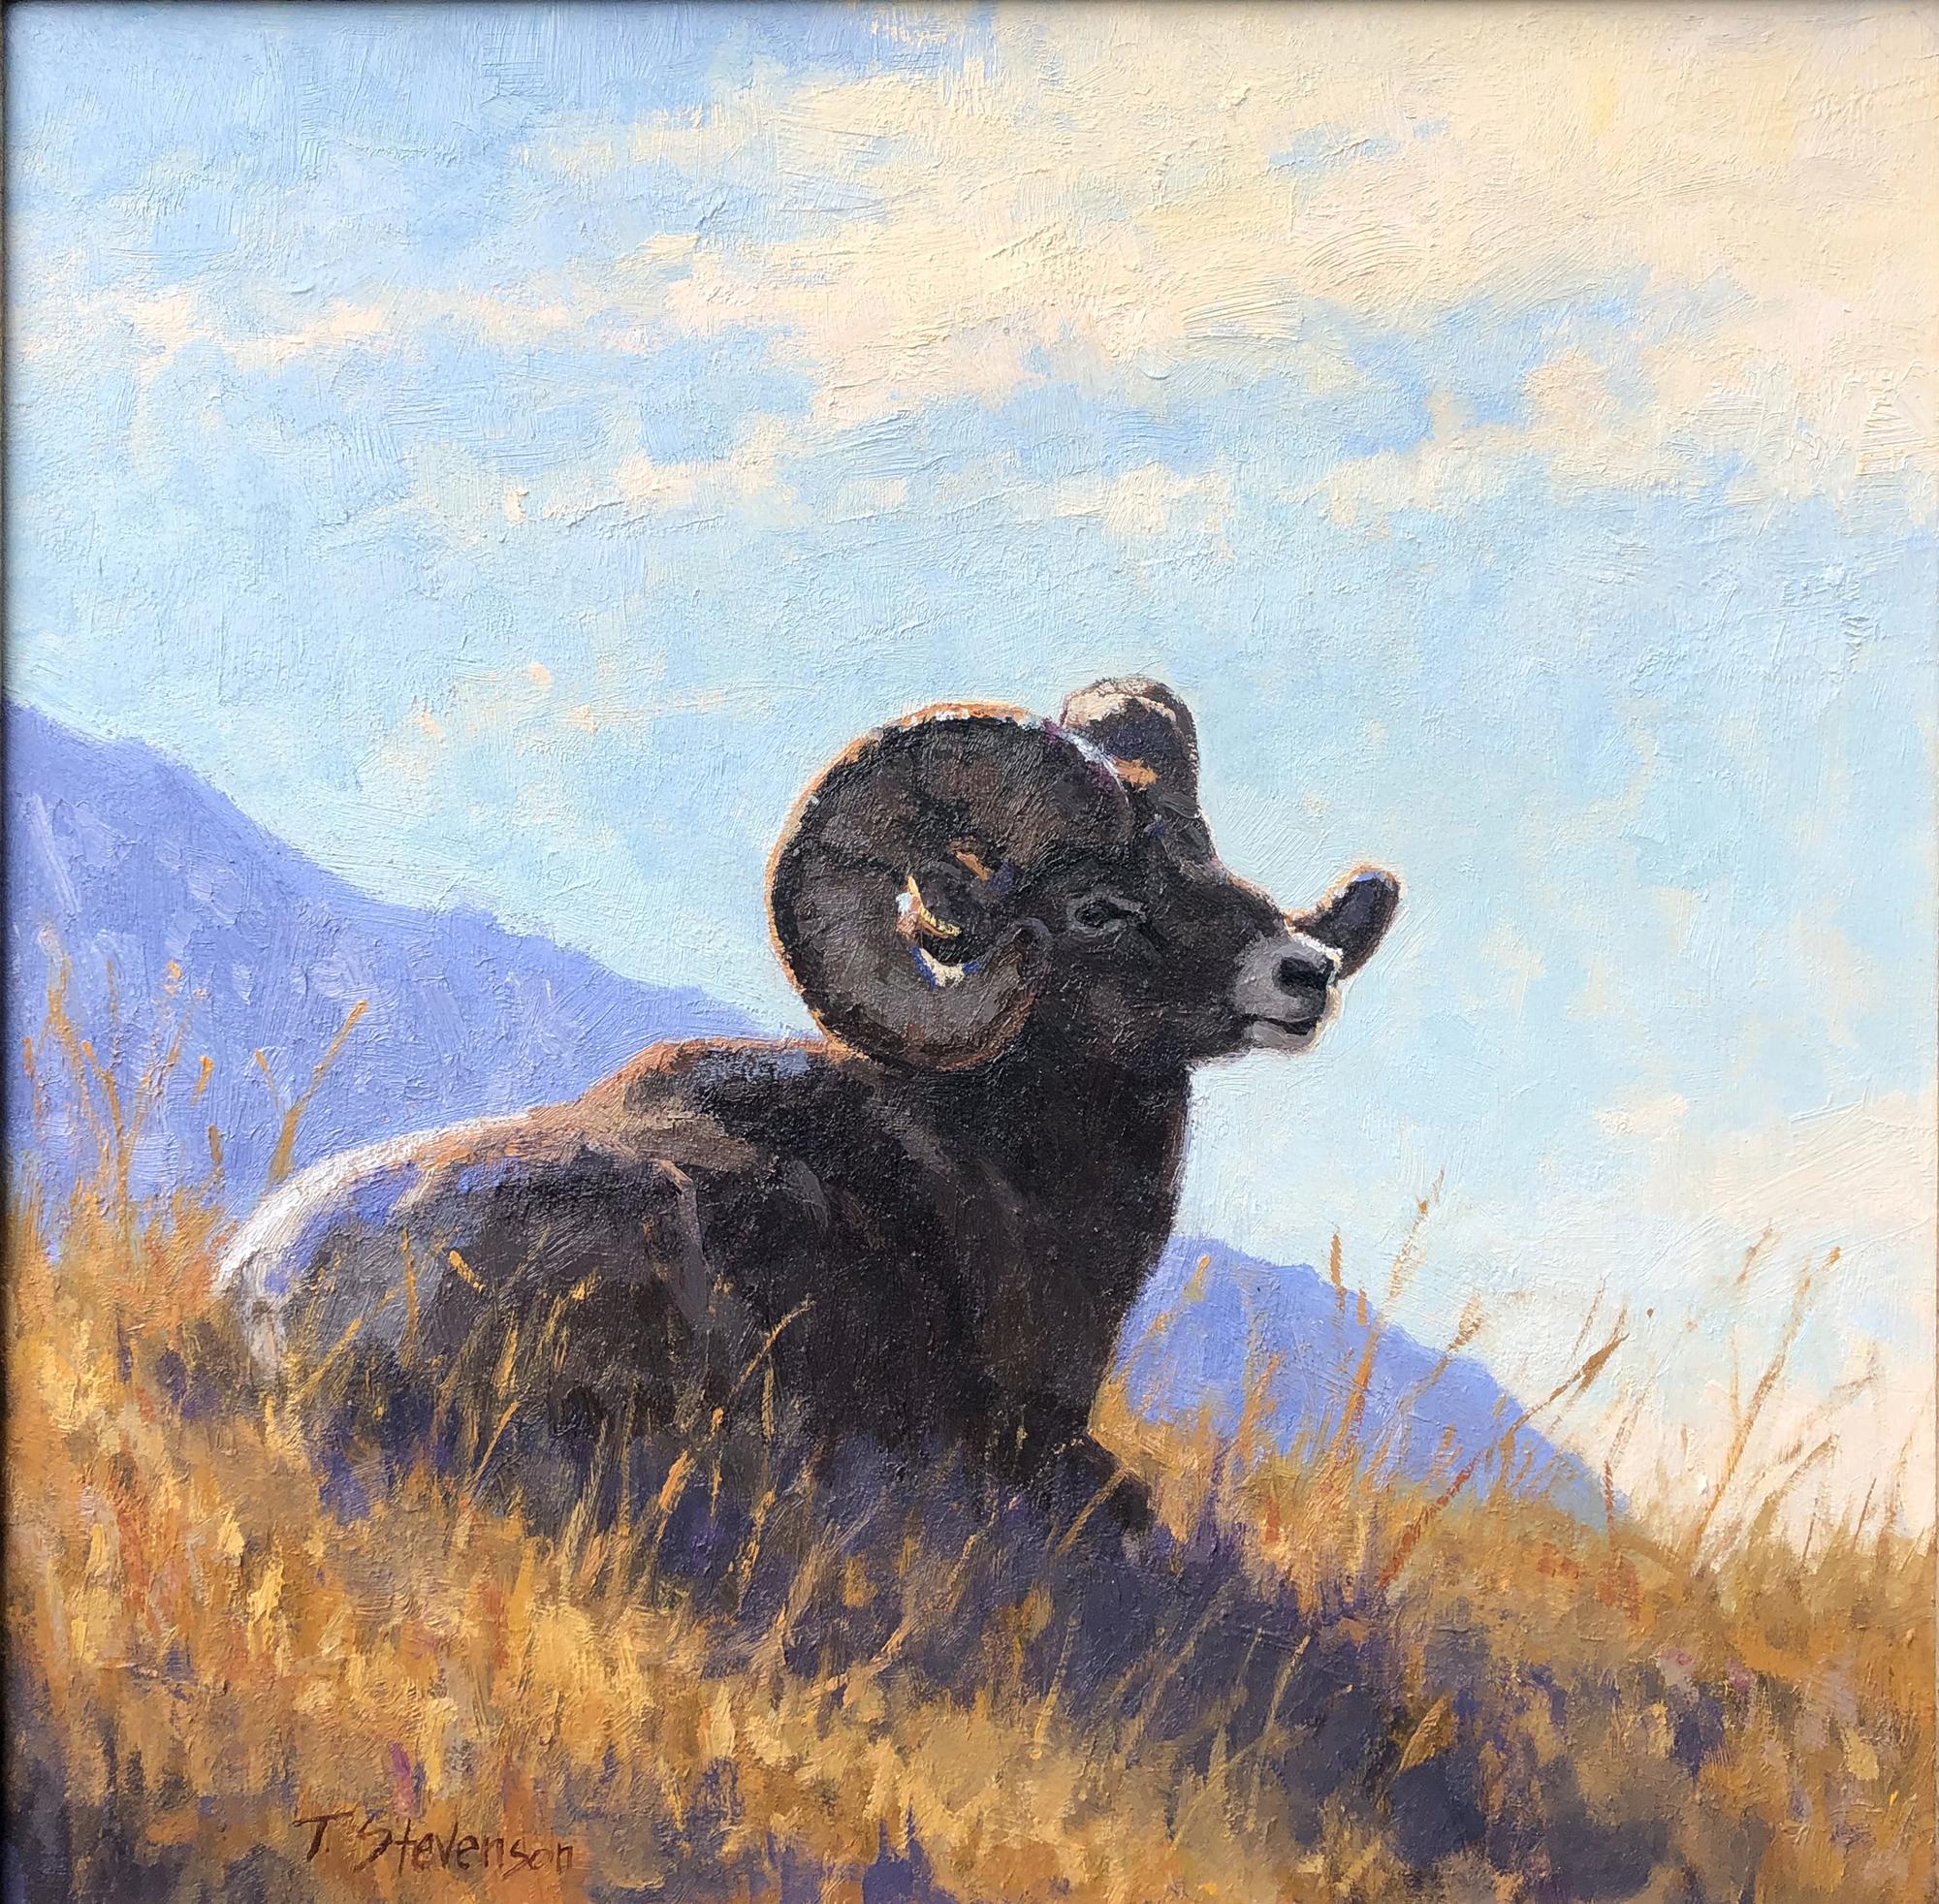 Rocky Mountain Ram by Tiffany Stevenson